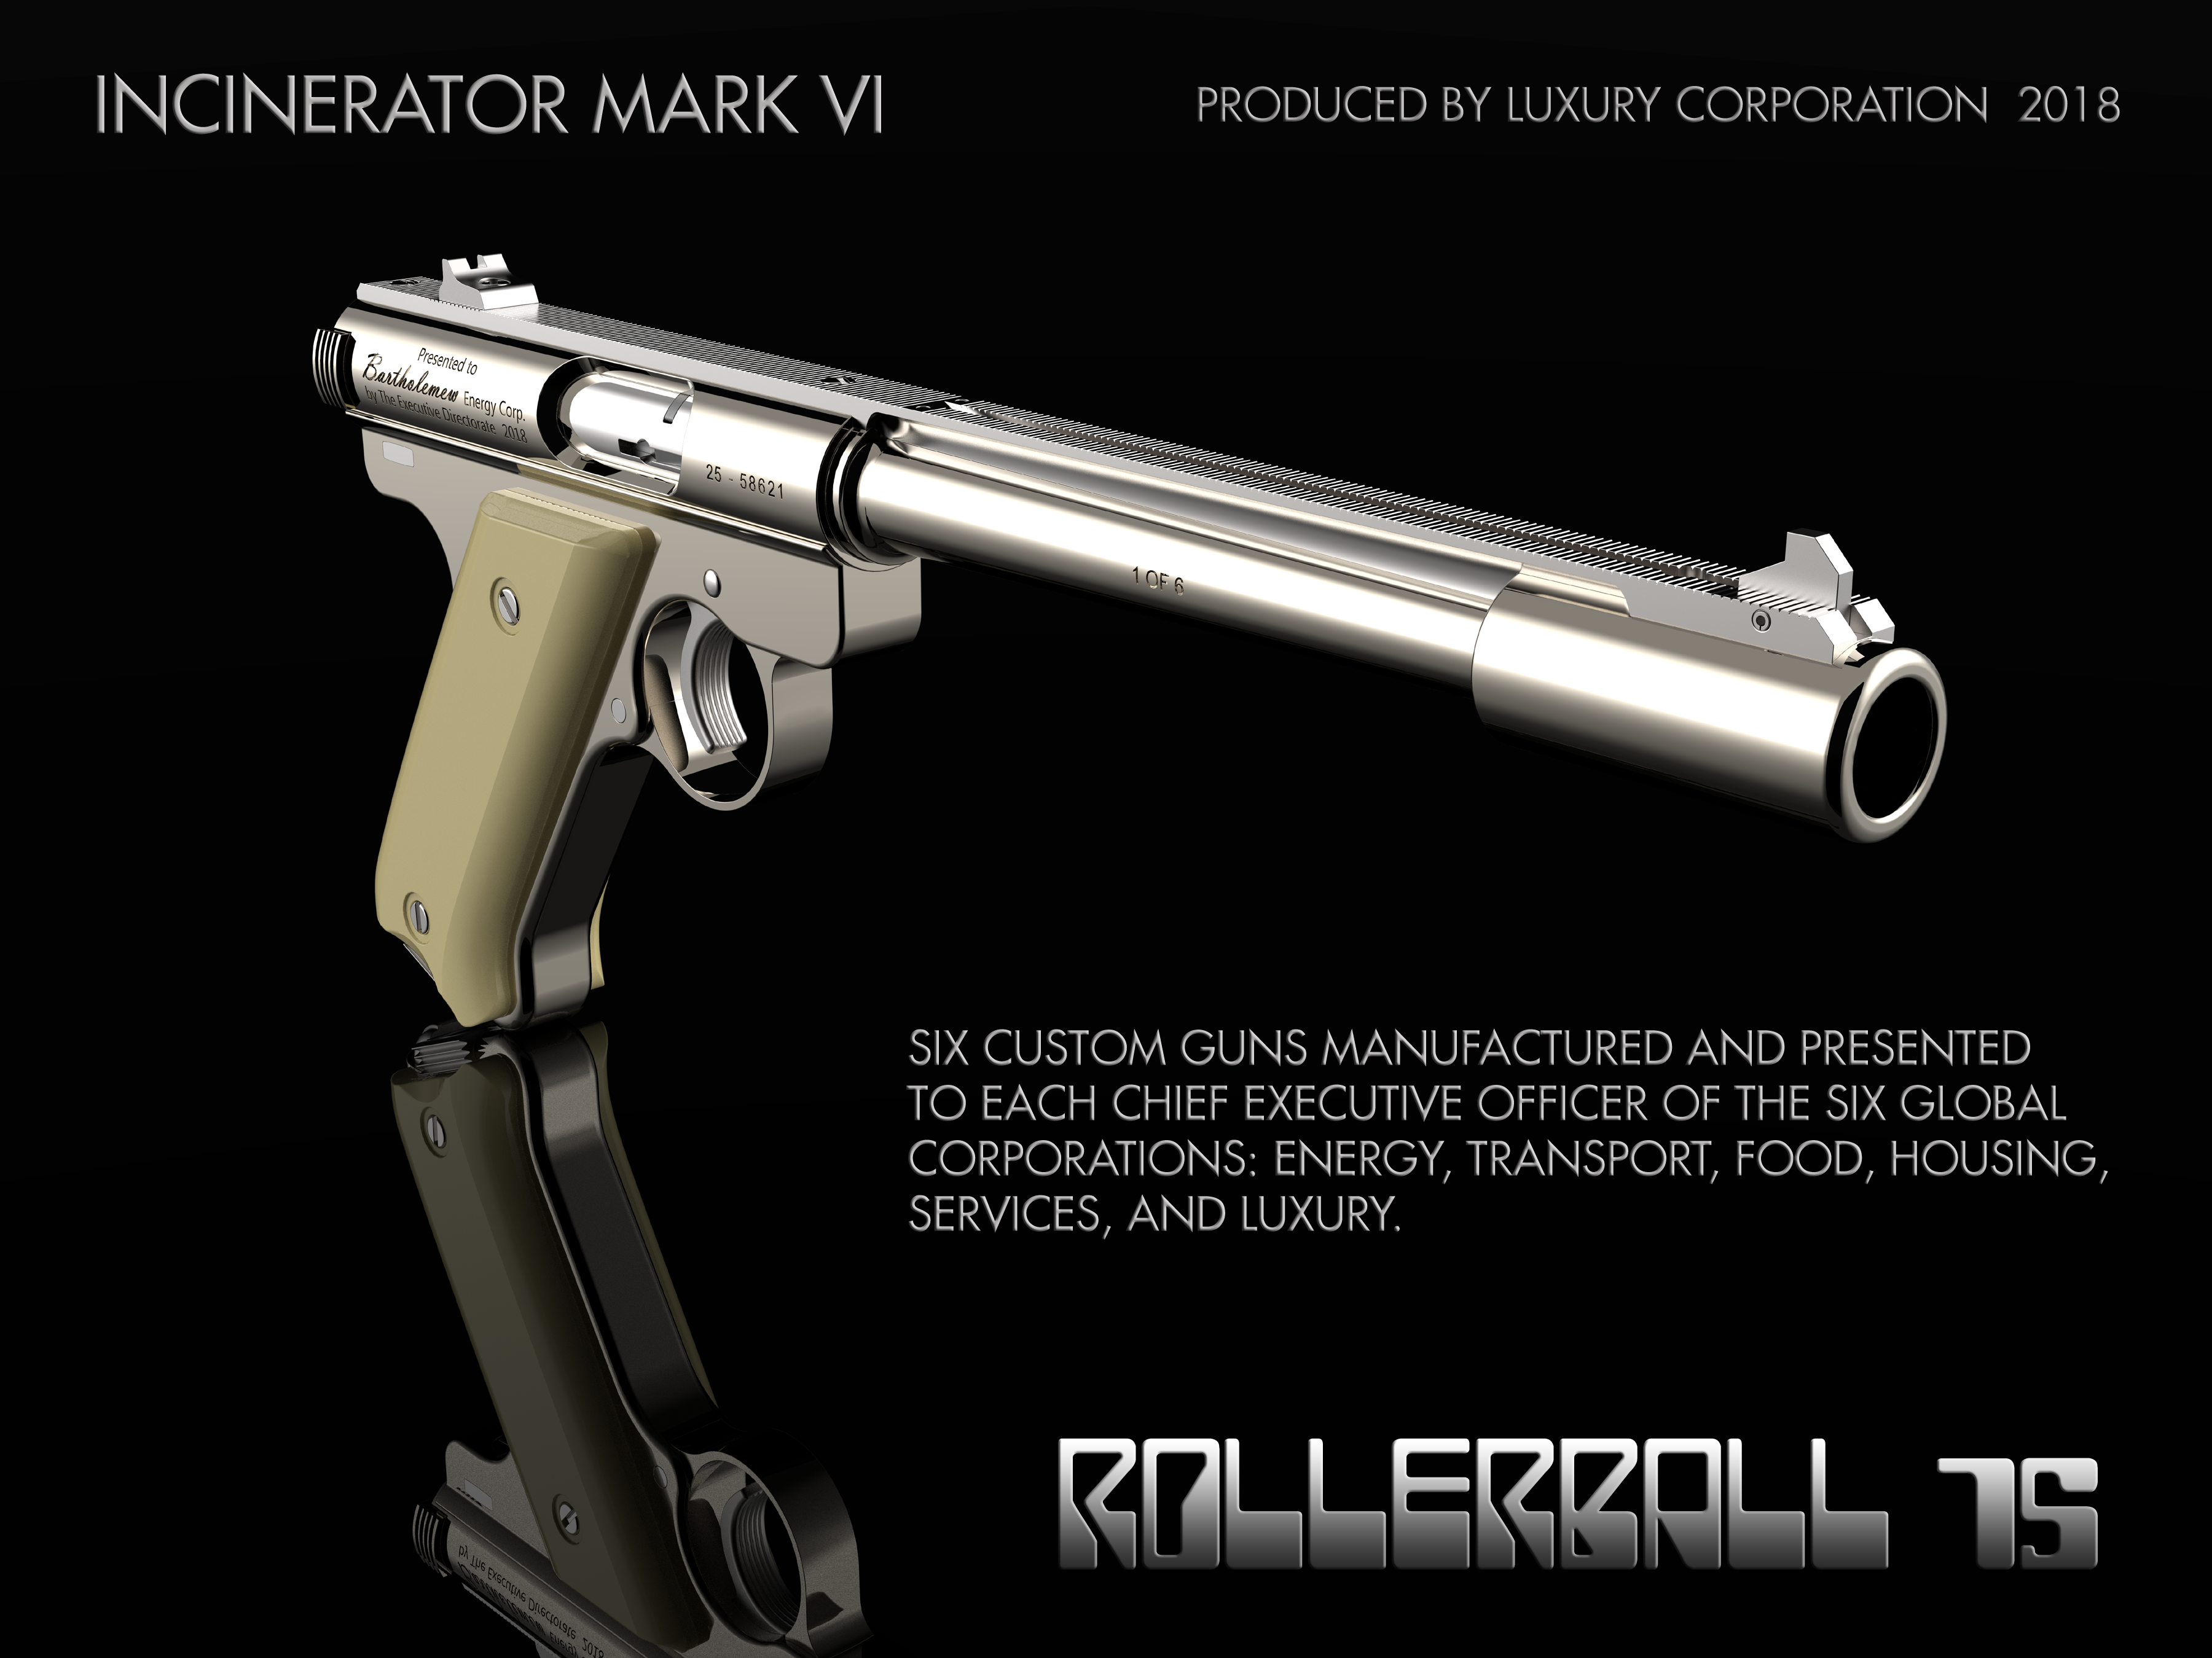 Rollerball%2075.1_zpsmsuddjfm.png